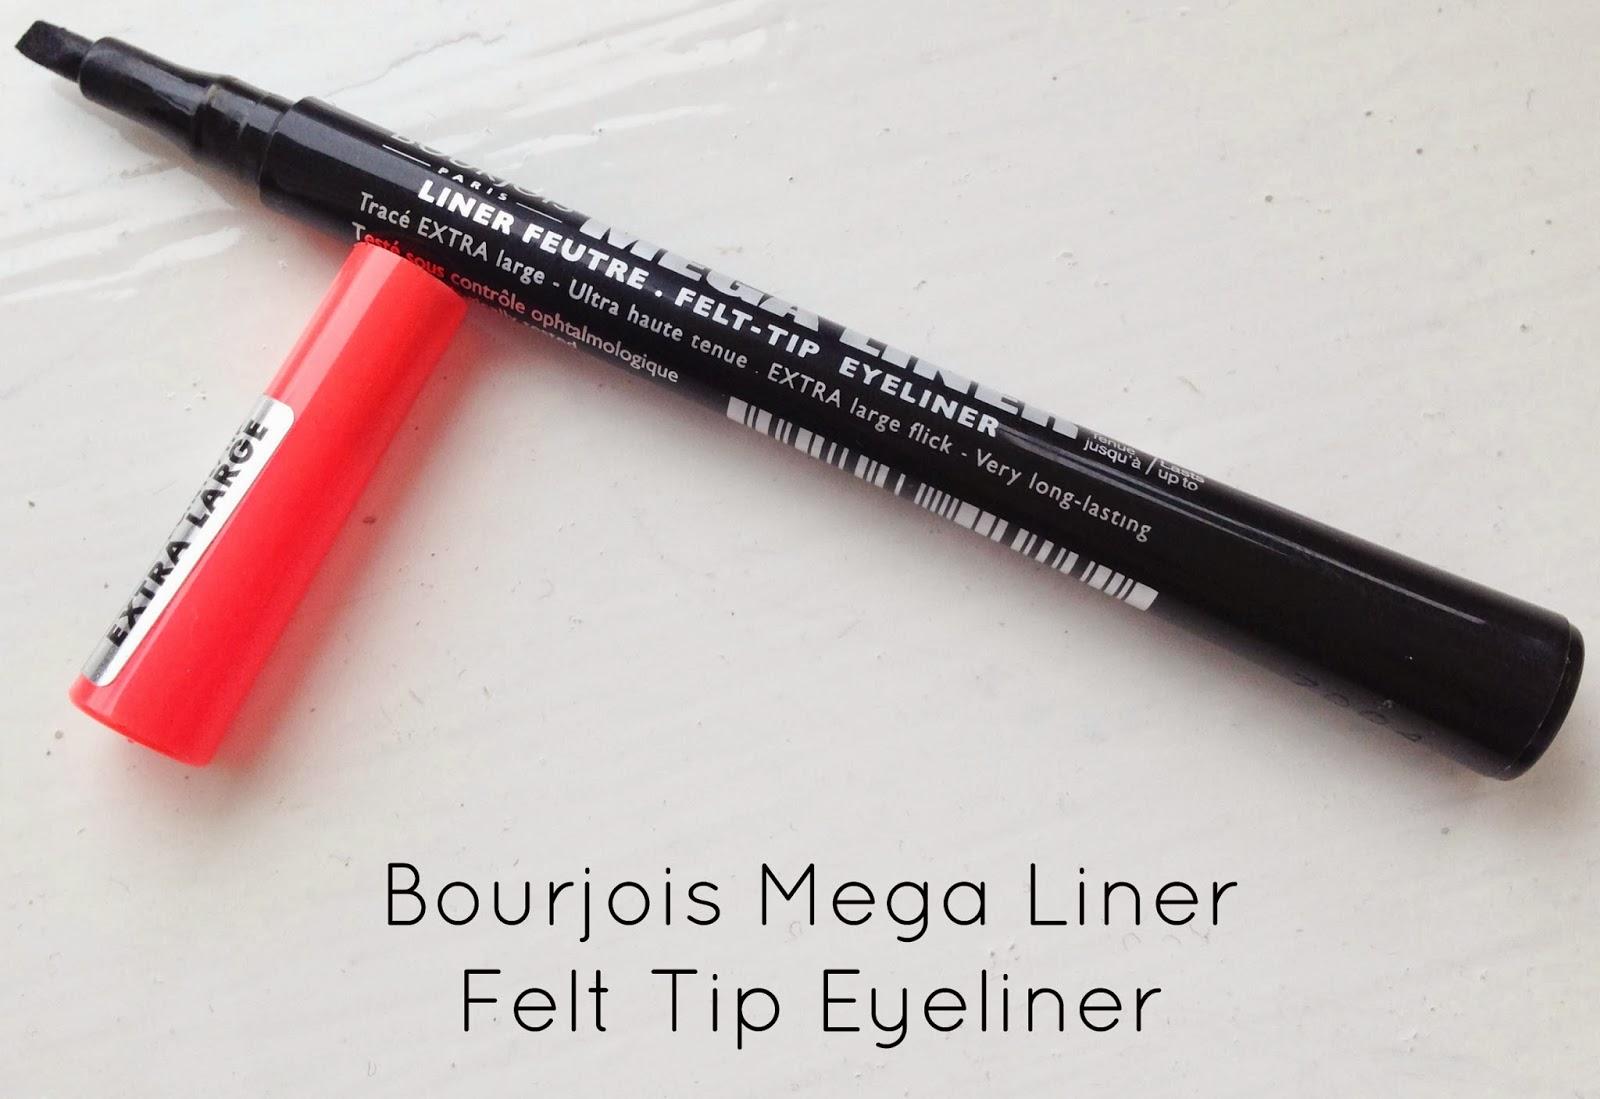 Bourjois Mega Liner Felt Tip Eyeliner